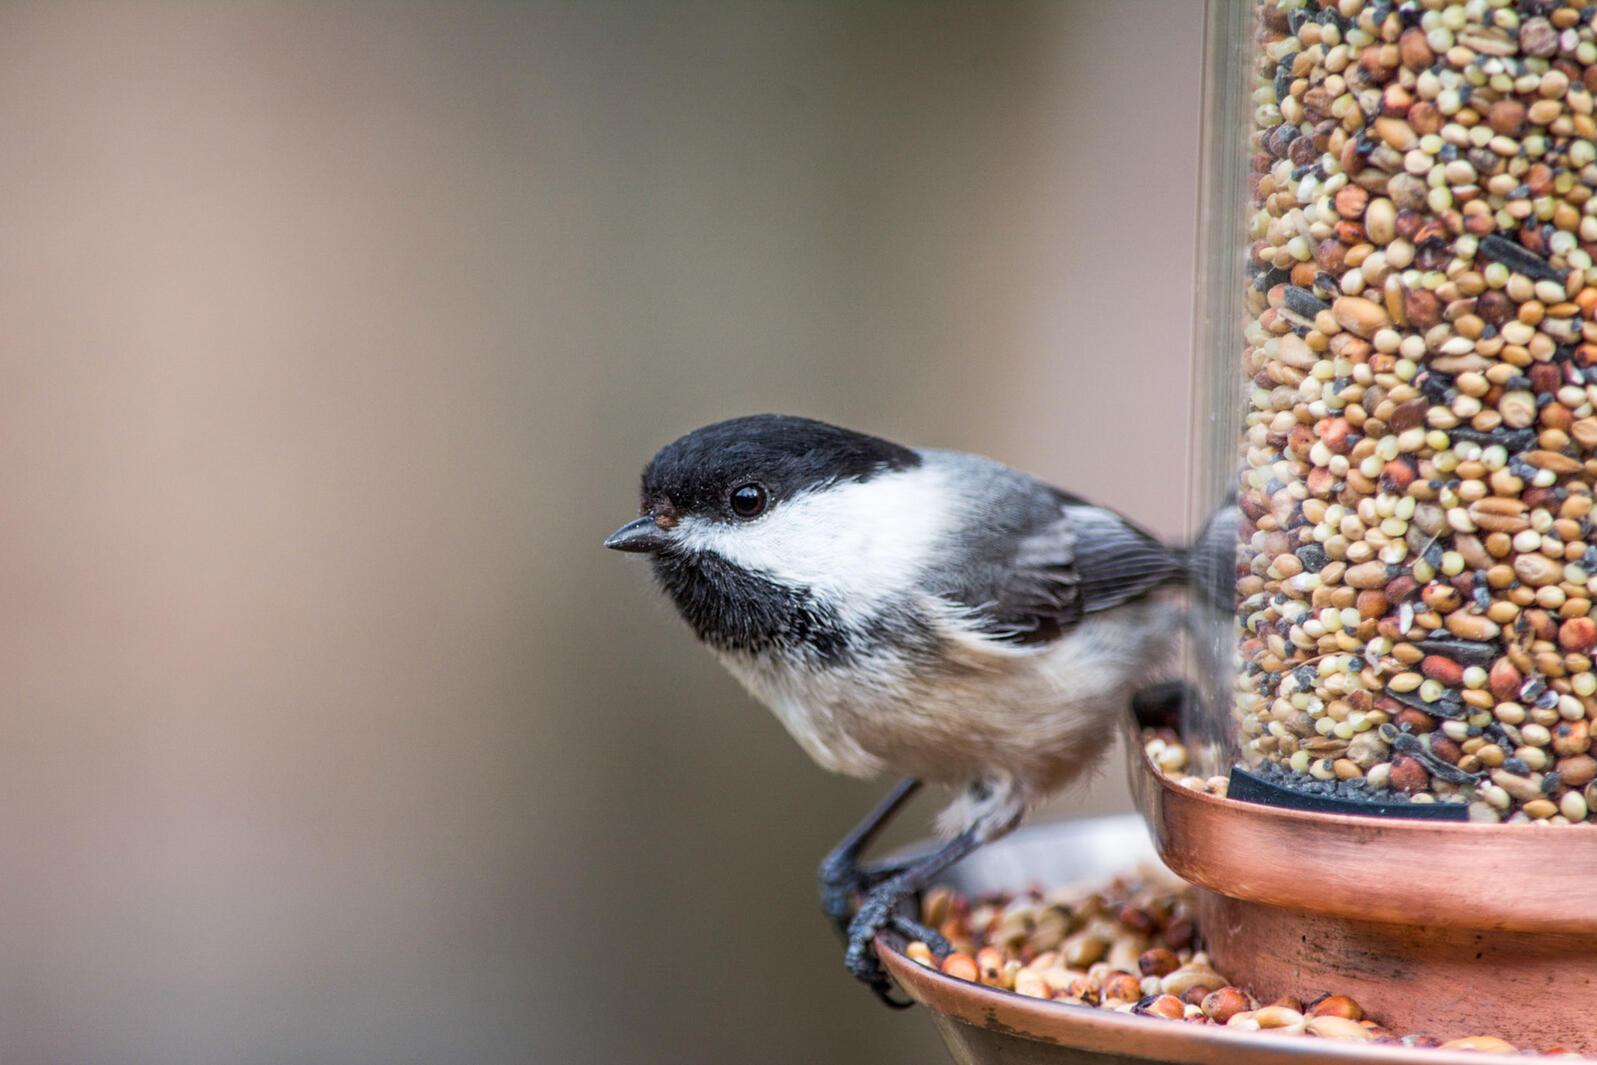 Black-capped Chickadee. Toni Herkalo-Koch/Audubon Photography Awards